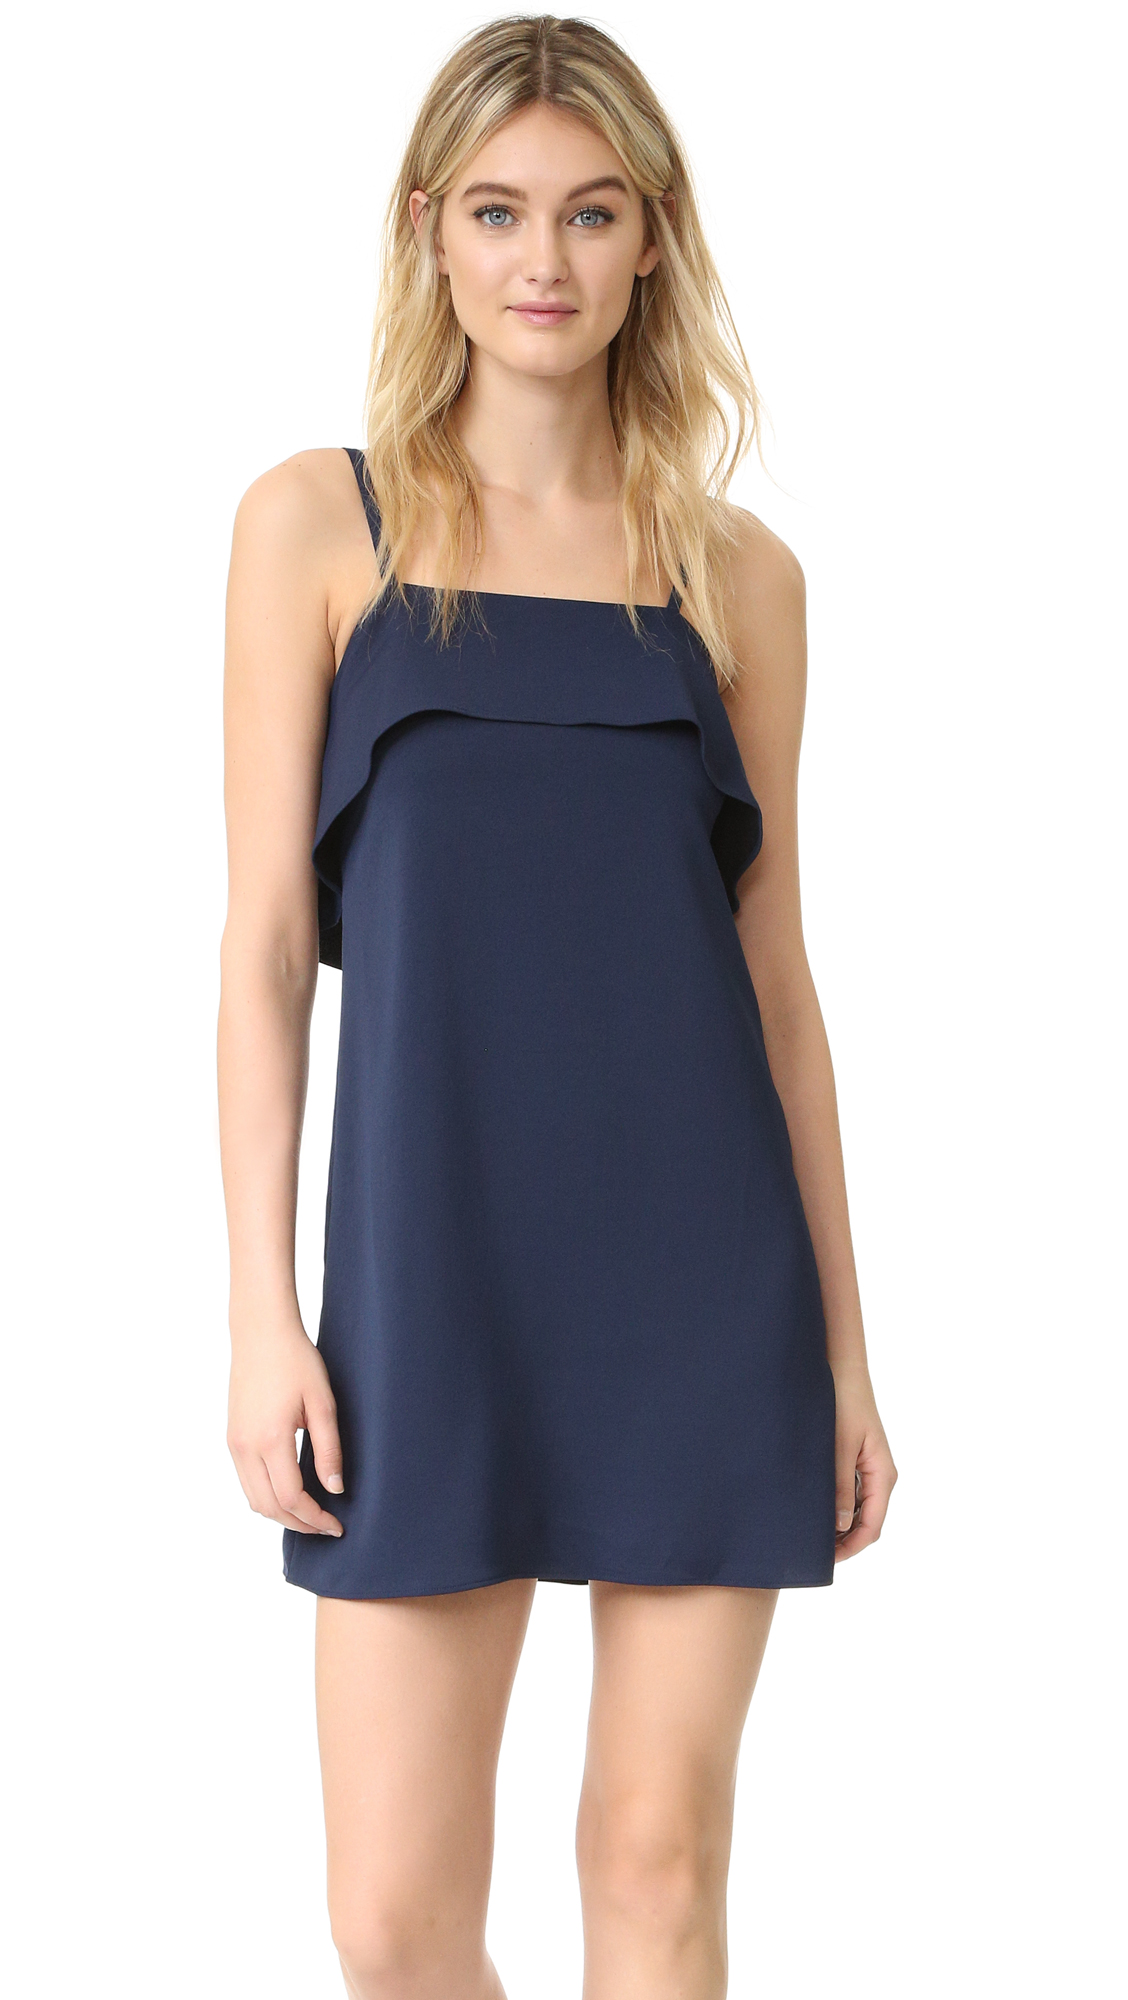 Alice + Olivia Etta Ruffle Slip Dress - Sapphire at Shopbop